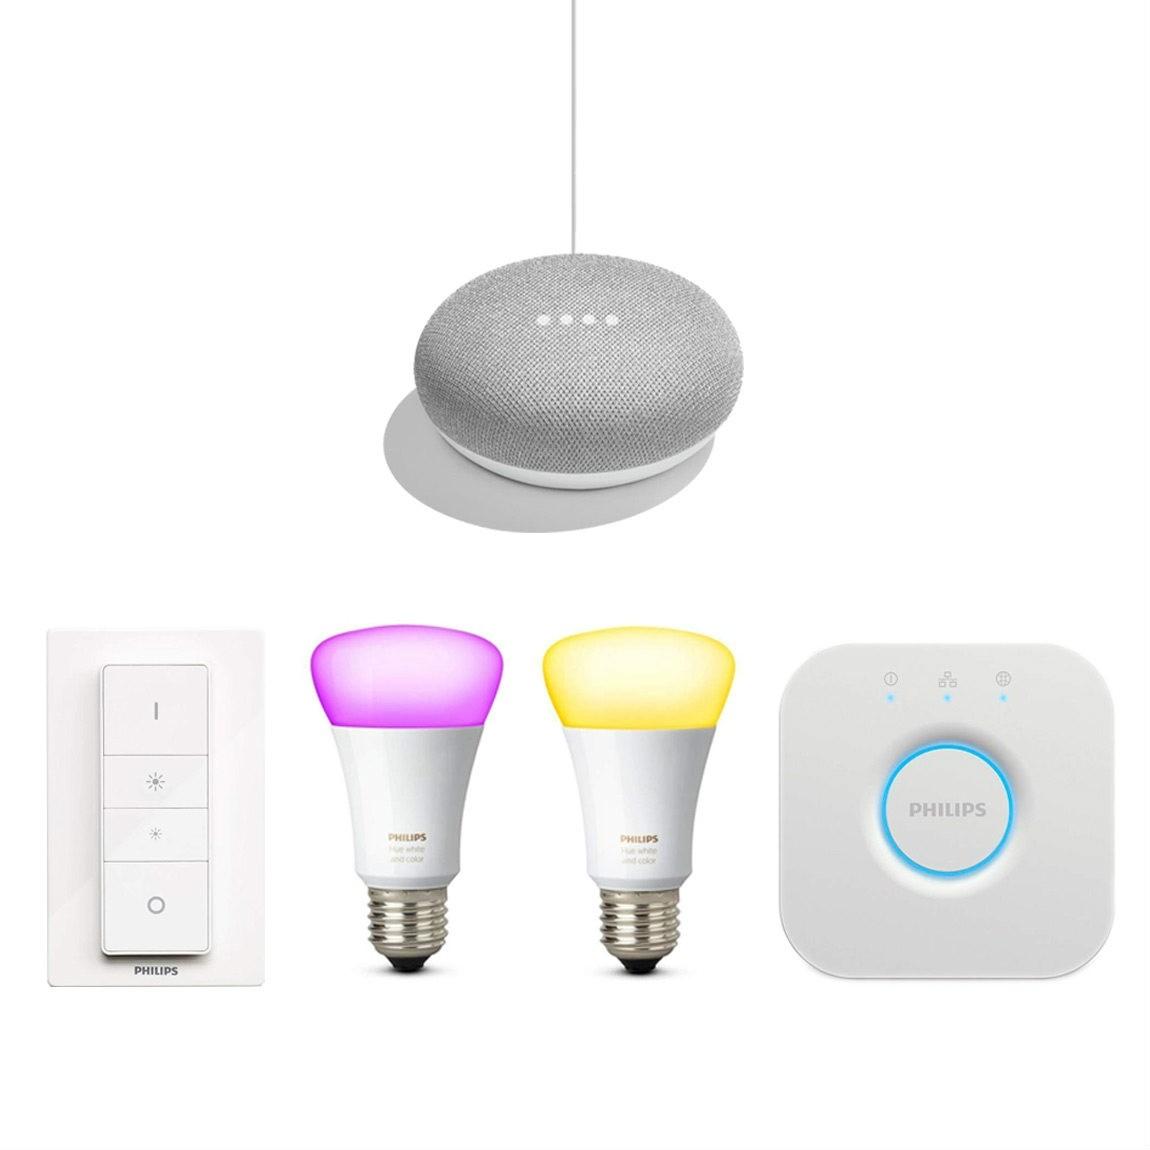 Philips Hue Color Starter Set lite + gratis Google Home Mini